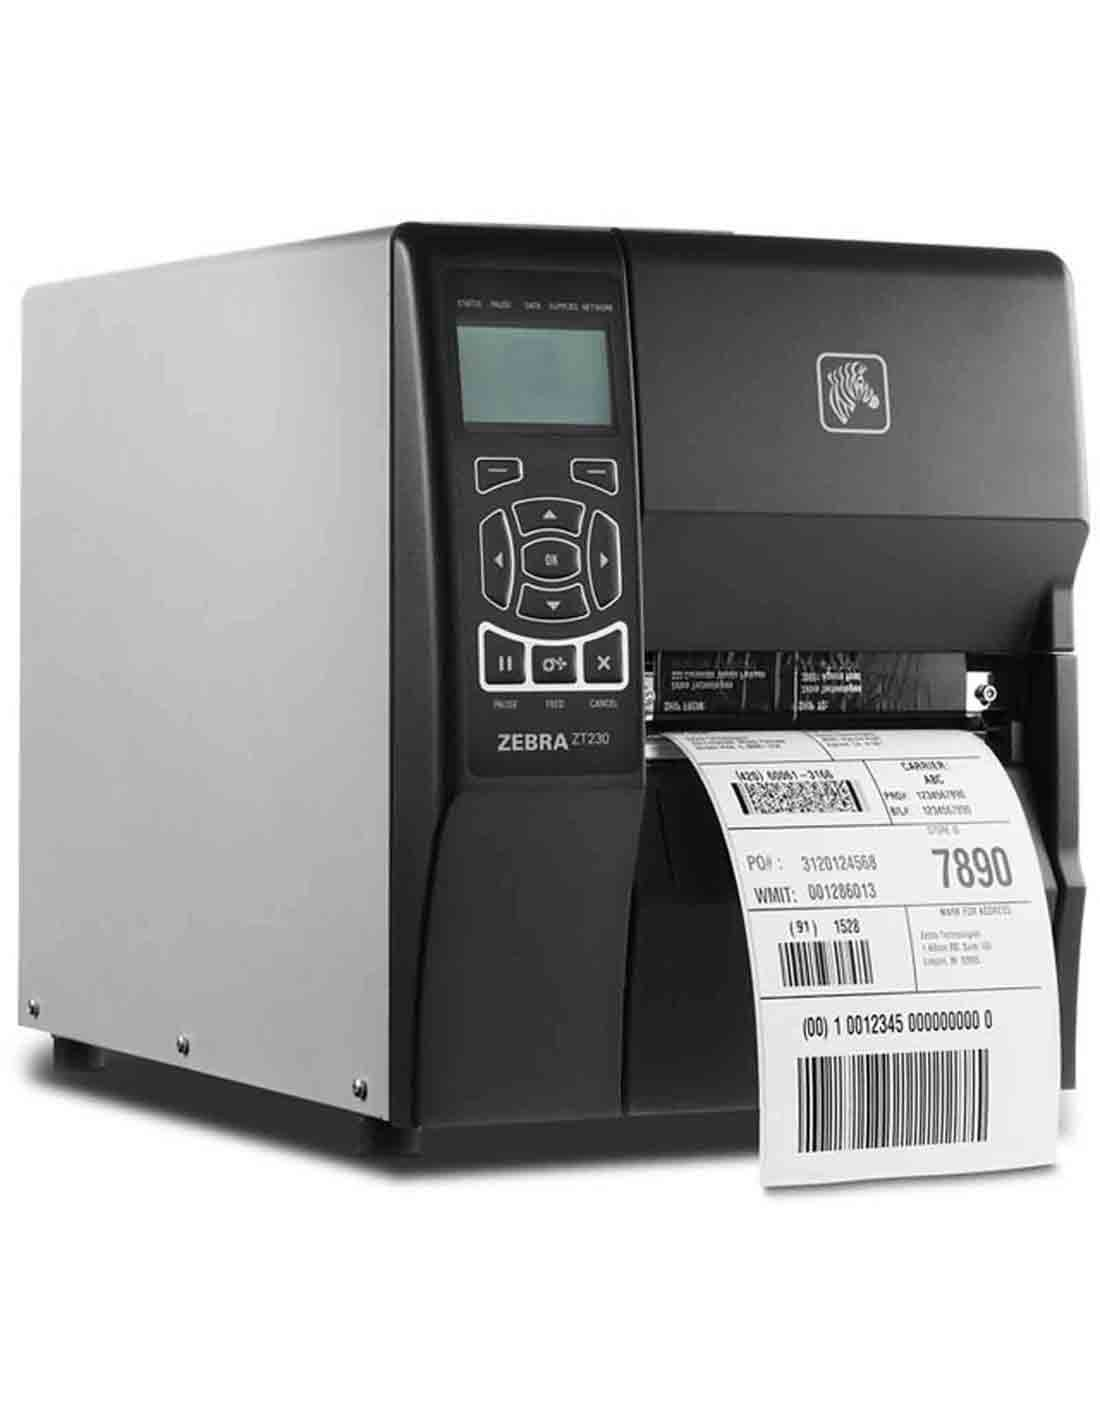 Zebra ZT23042-T0E000FZ Barcode Printer Buy Online at an affordable Price in Dubai